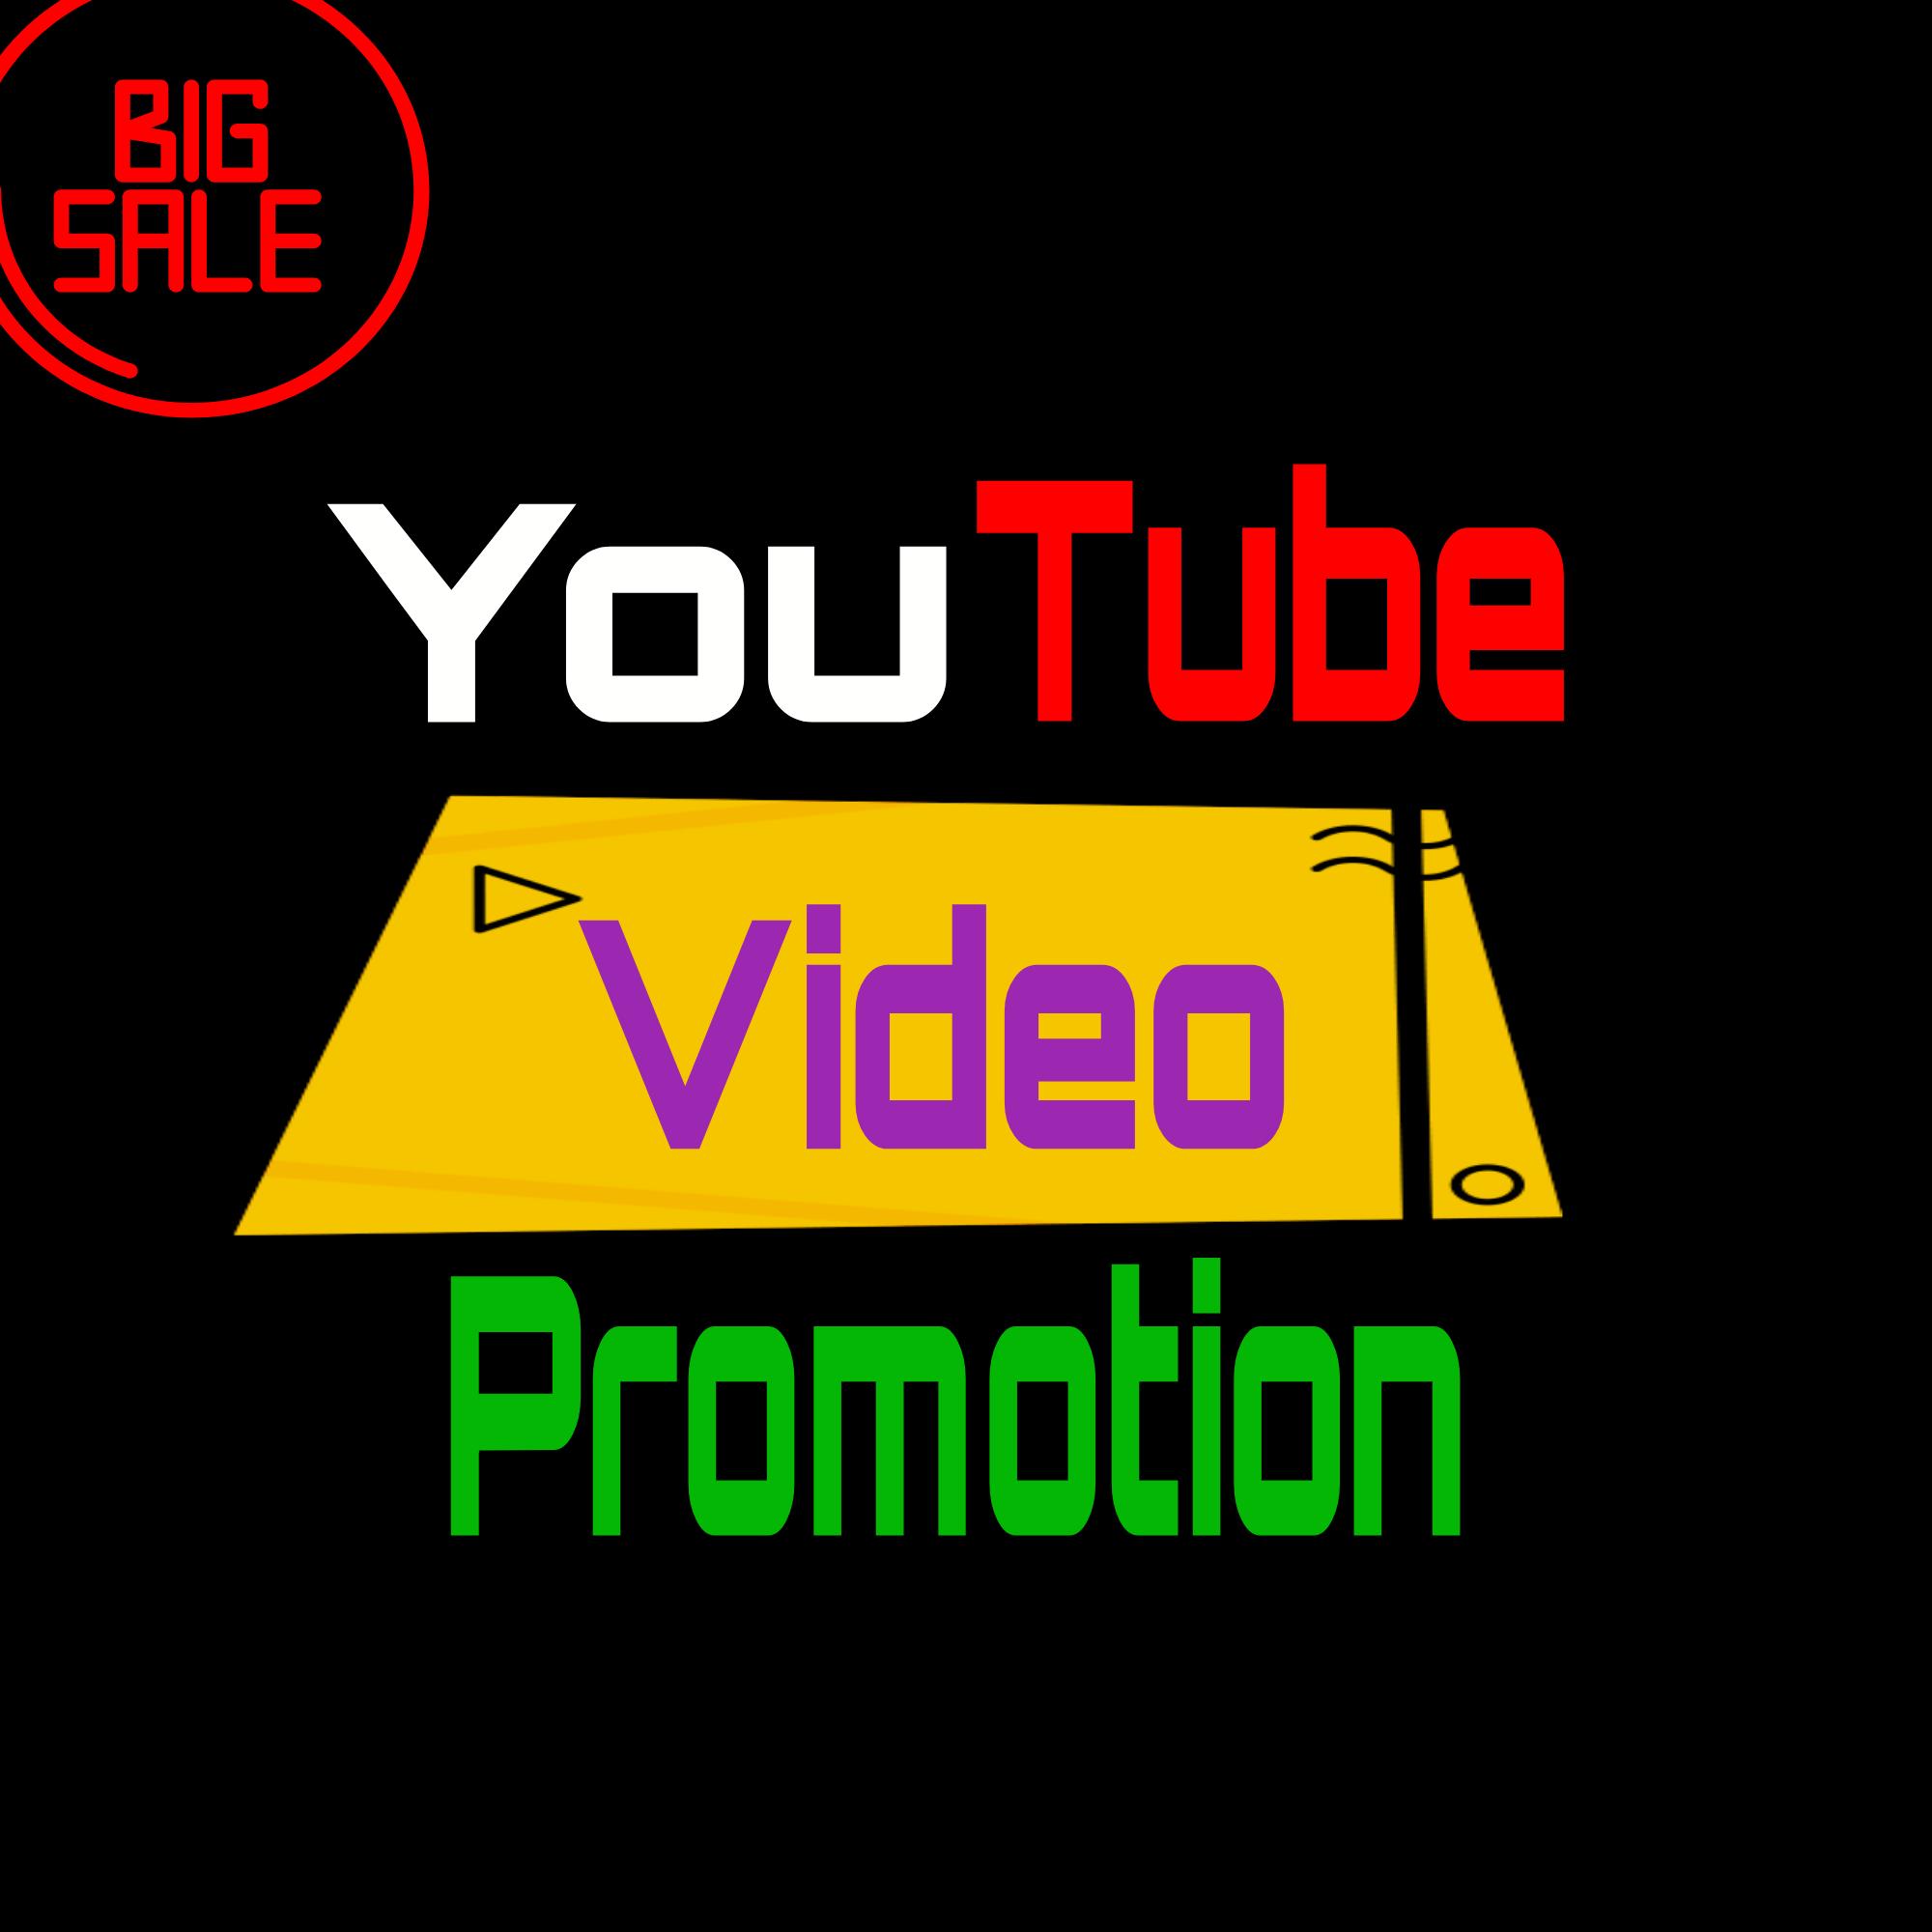 Genuine YouTube Video Promotion marketing